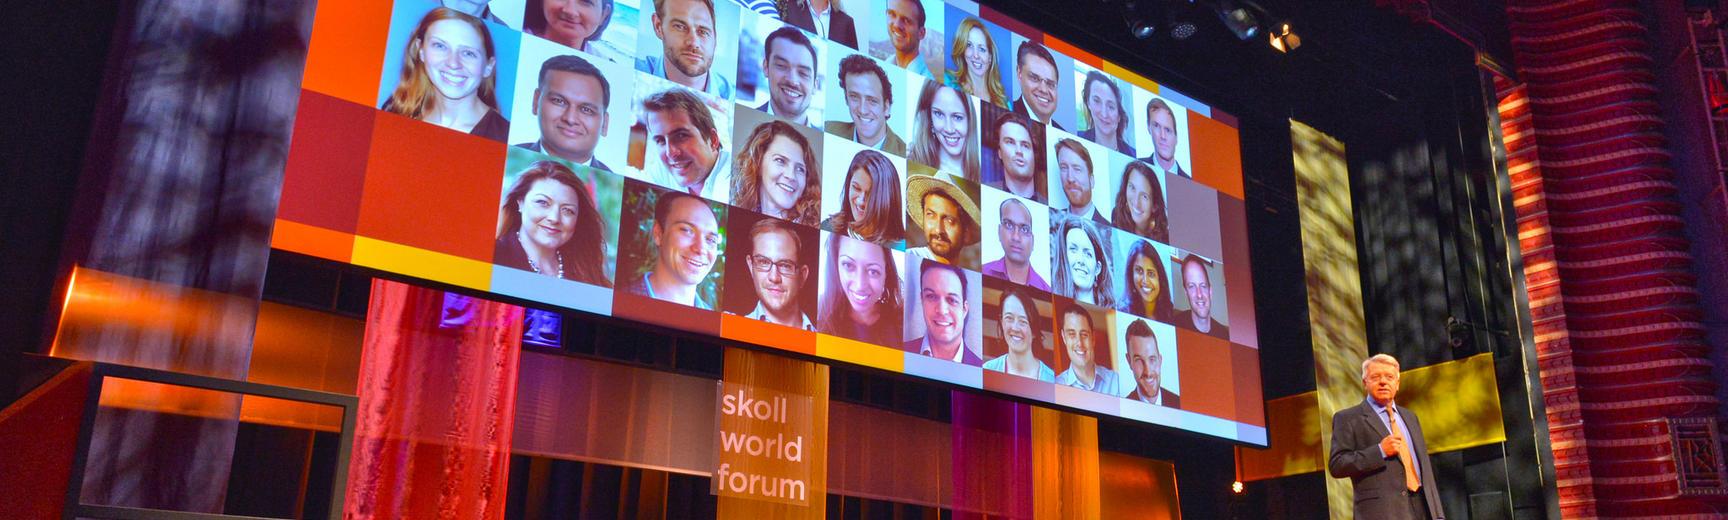 celebrating 10 years skoll scholarship at the Skoll World Forum